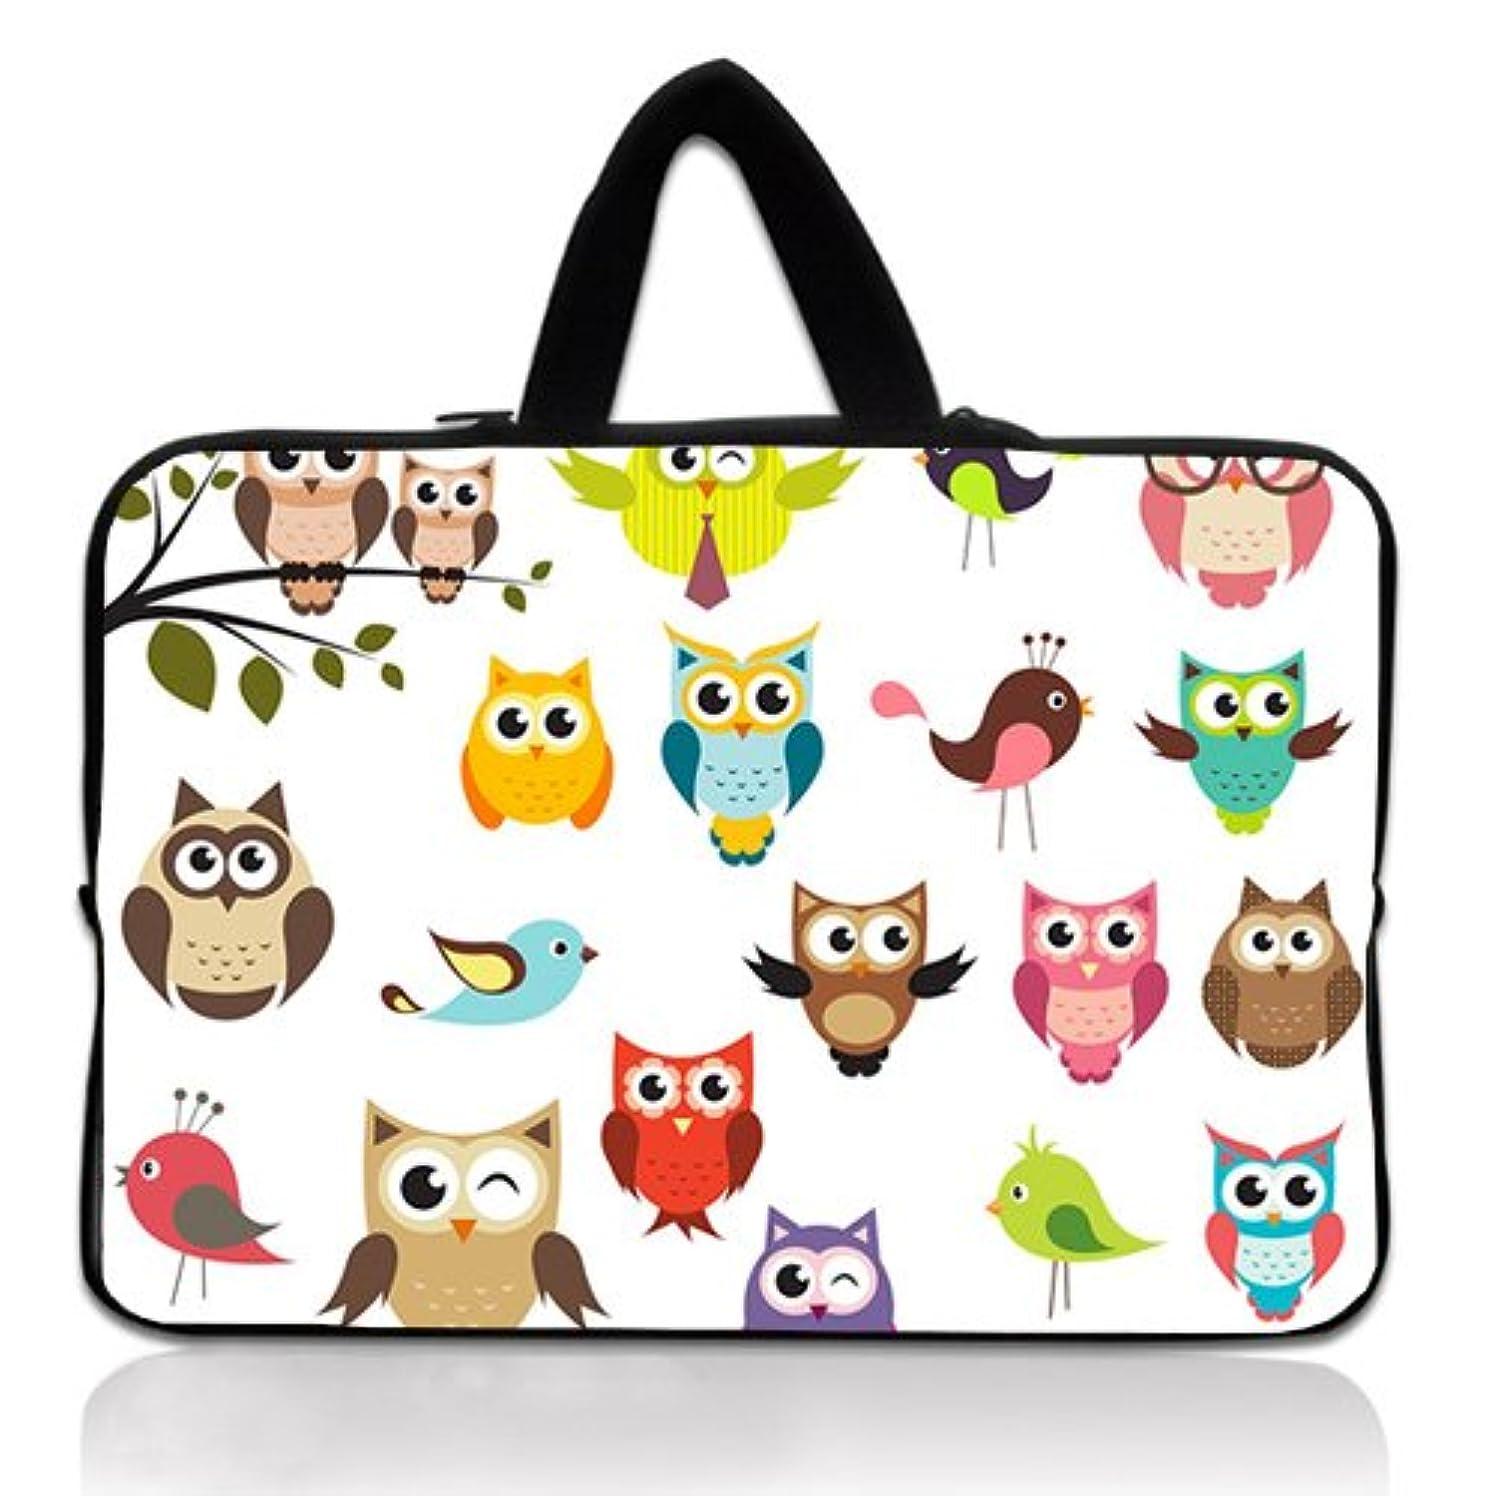 Wondertify 15-15.6 Inch Waterproof Neoprene Laptop Handbag Sleeve Briefcase - Owl Protective Bag Carrying Case for MacBook/ASUS/HP/Toshiba/Dell/Sony/Ultrabook/Men/Women